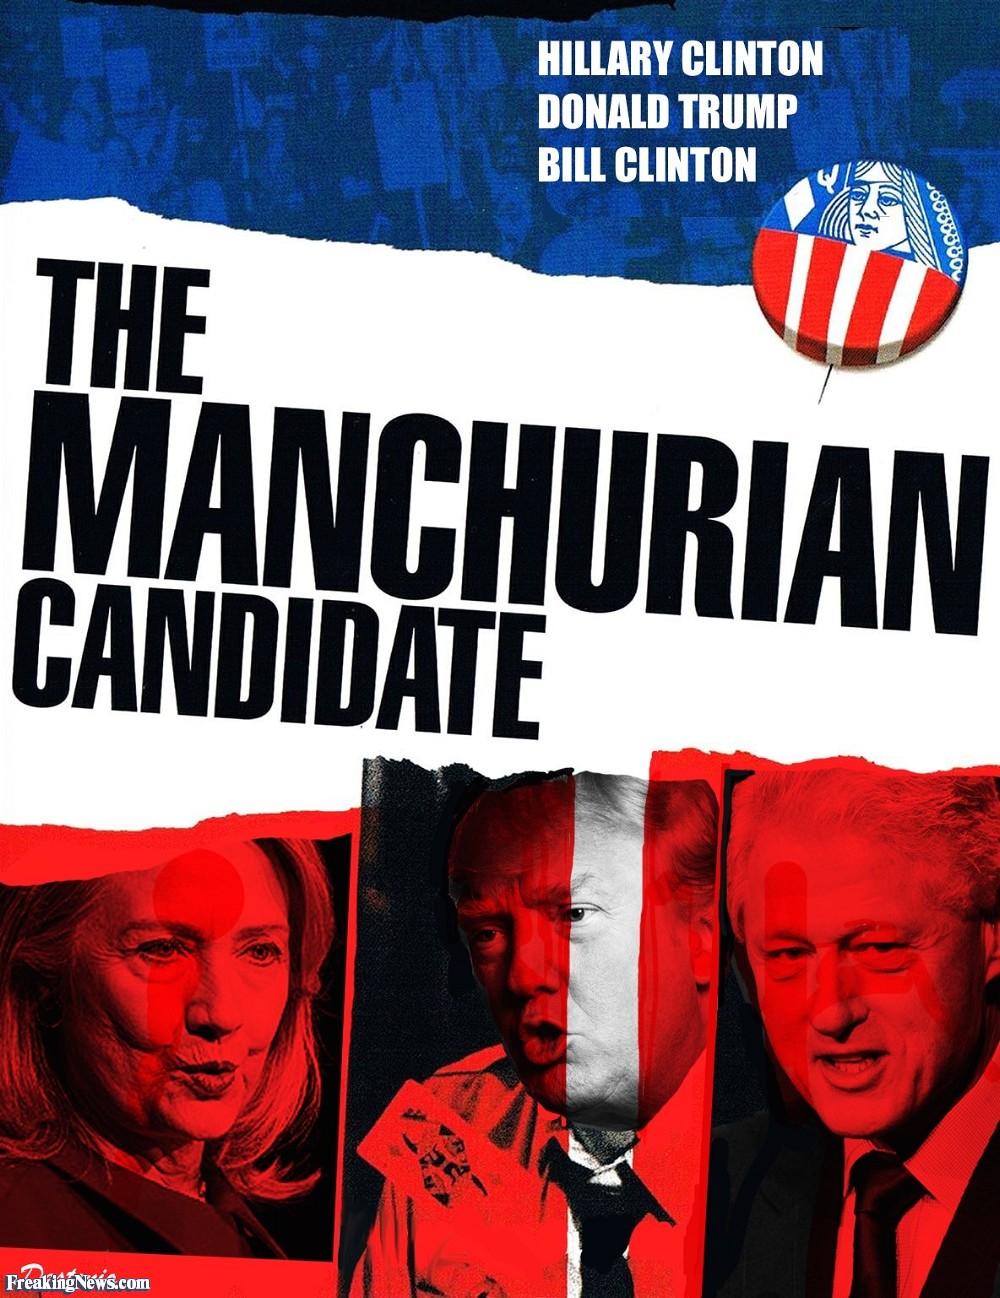 donald-trump-the-manchurian-candidate-125554